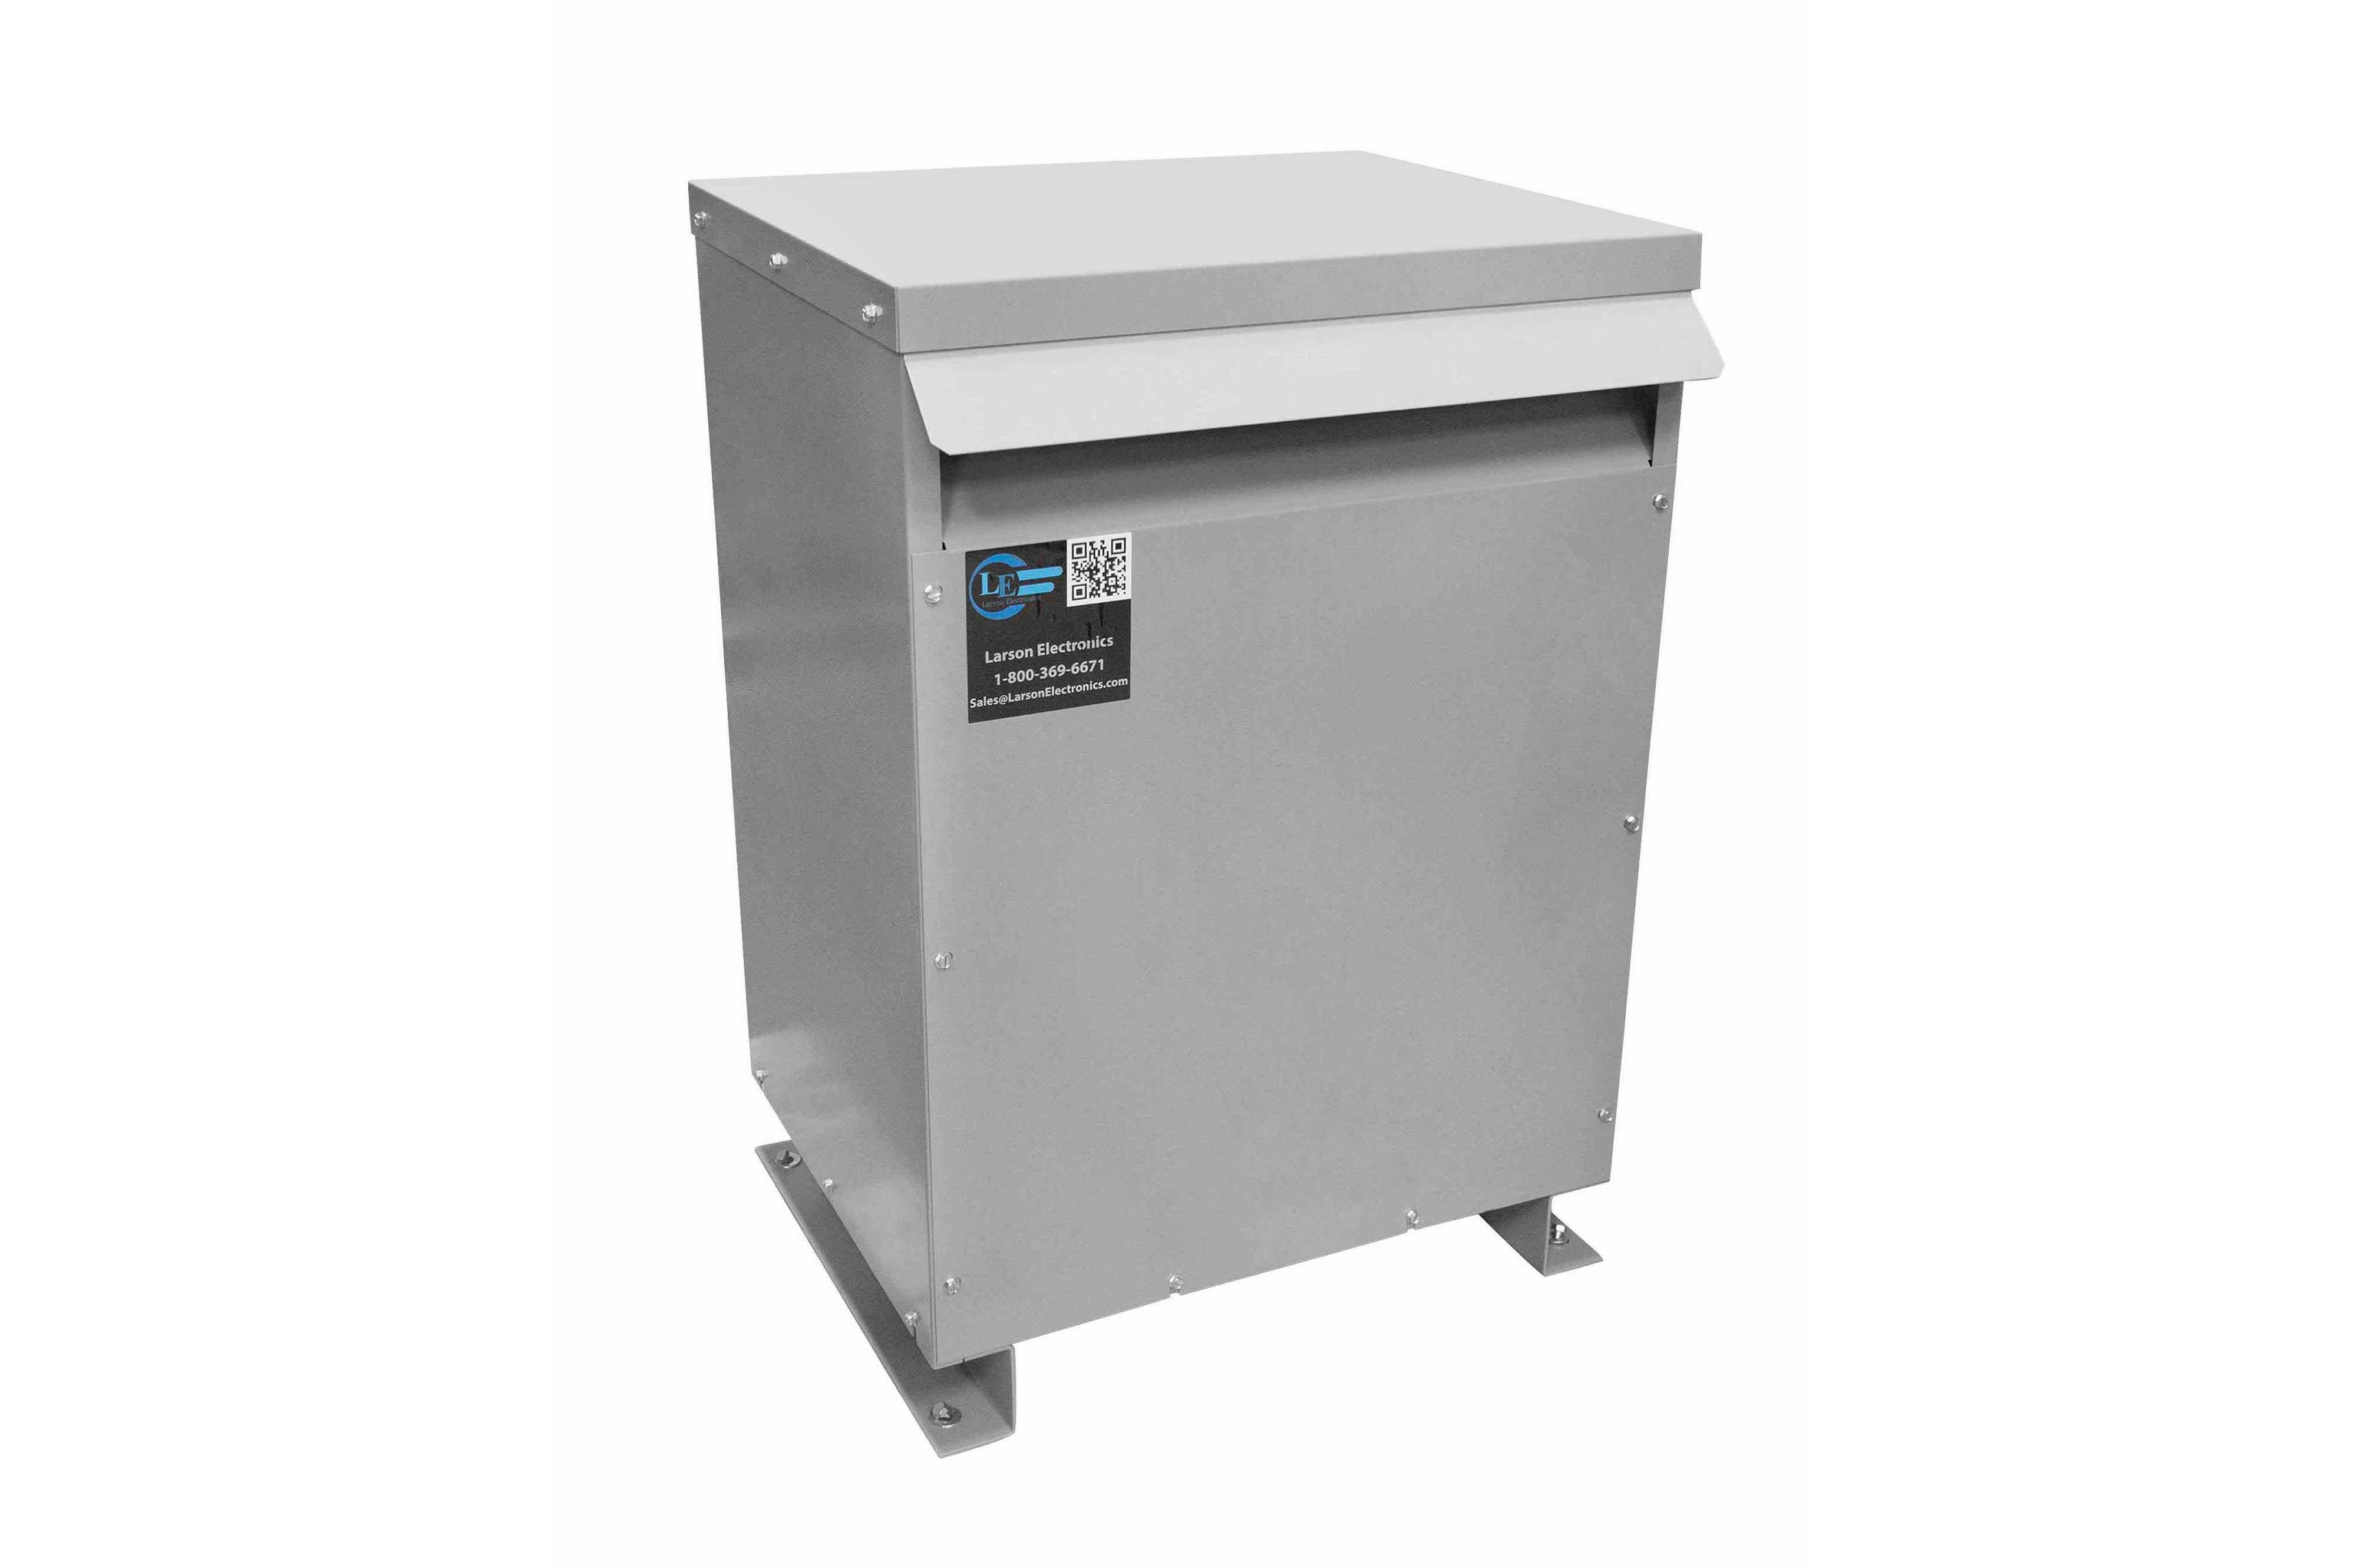 36 kVA 3PH Isolation Transformer, 380V Wye Primary, 240V Delta Secondary, N3R, Ventilated, 60 Hz